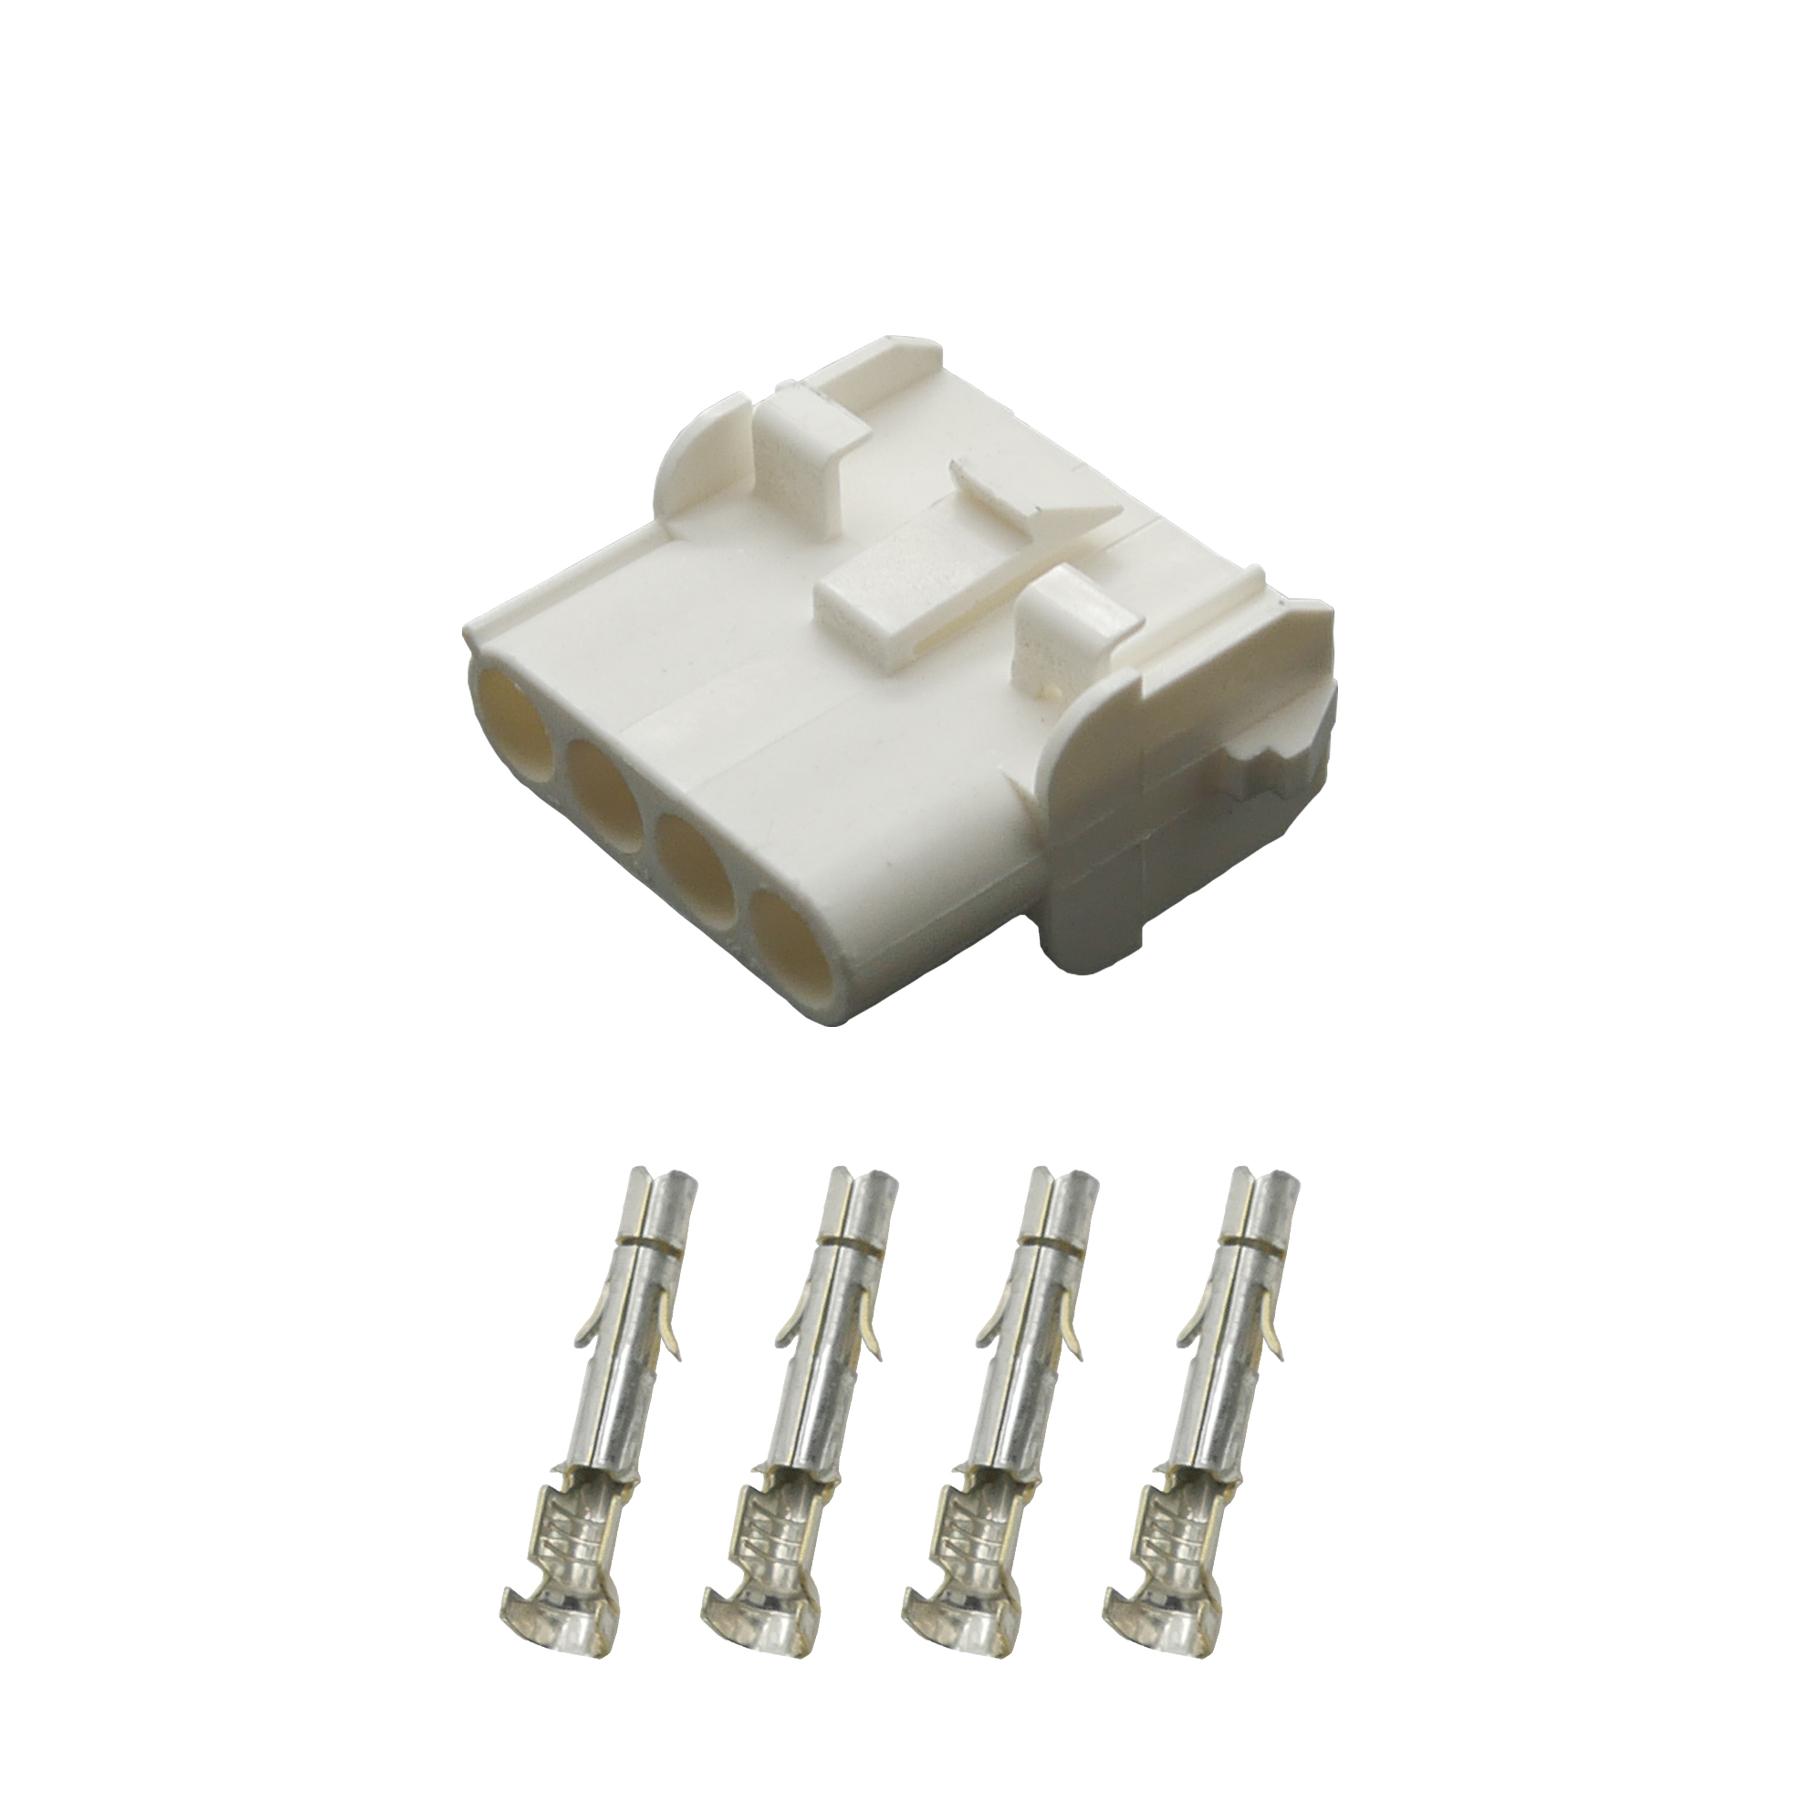 Kontakten Stecker Set Steckverbinder Universal Mate N Lok 5-polig incl